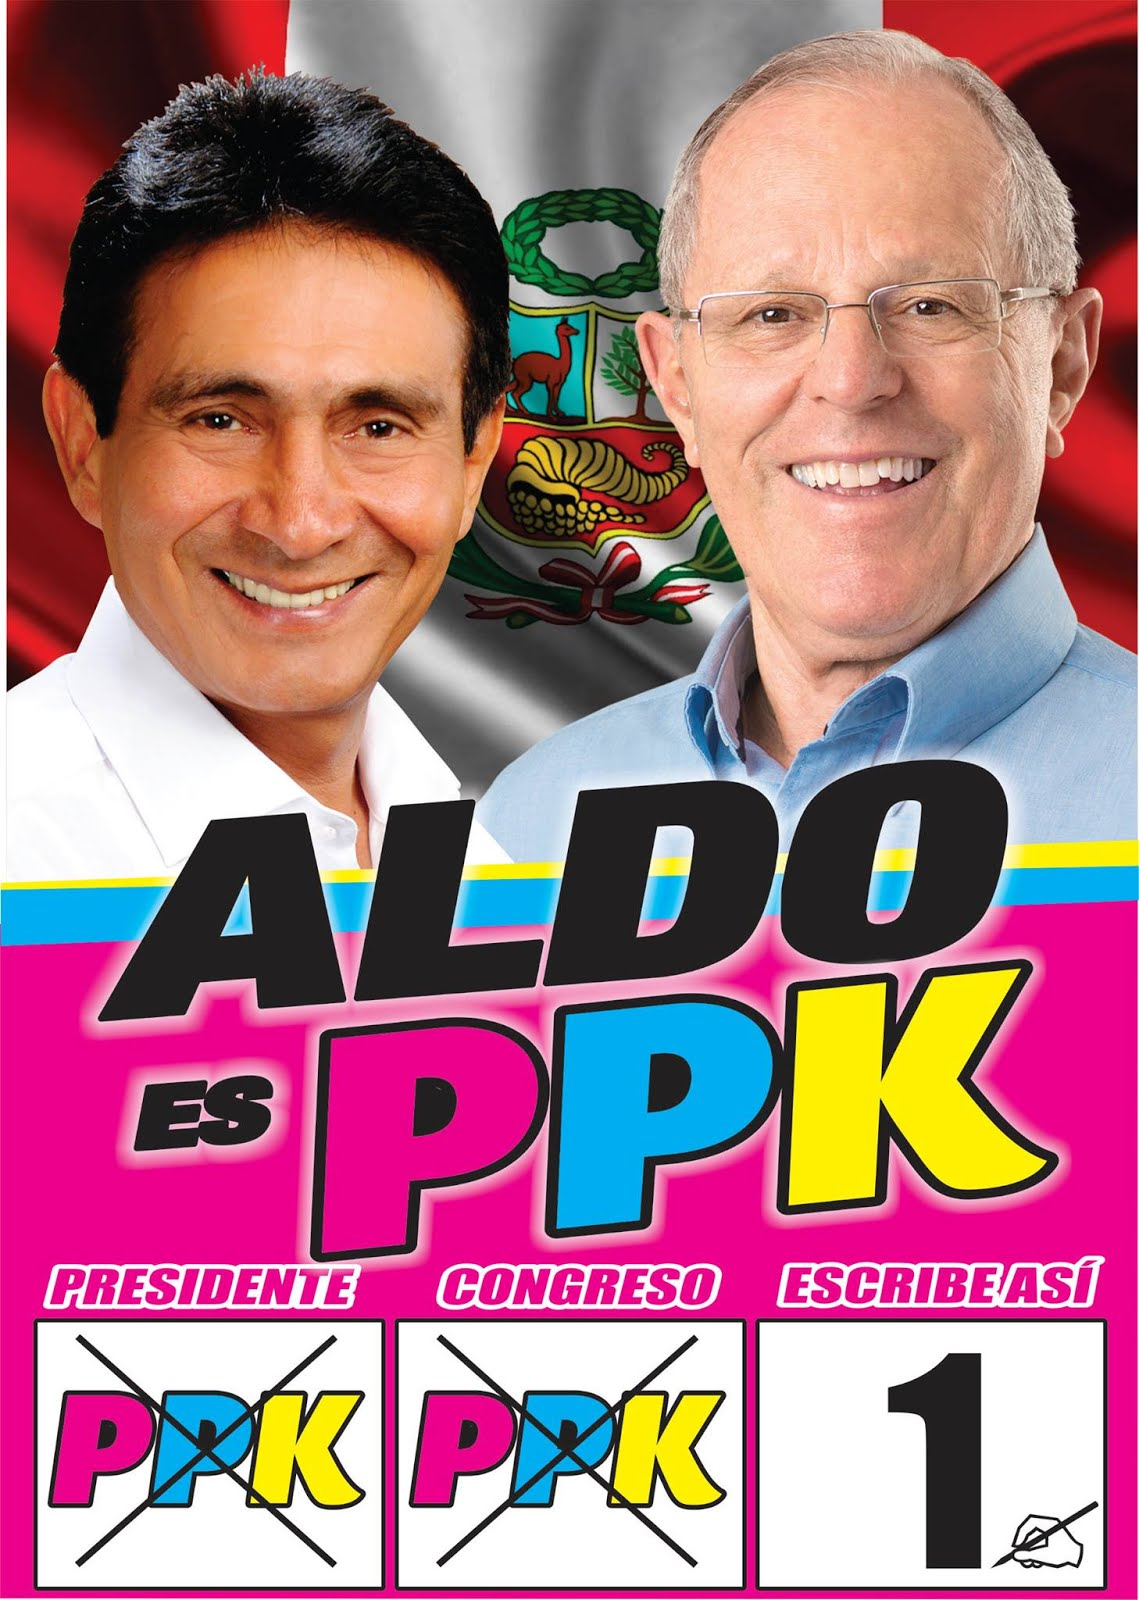 AVISO POLÍTICO CONTRATADO 2